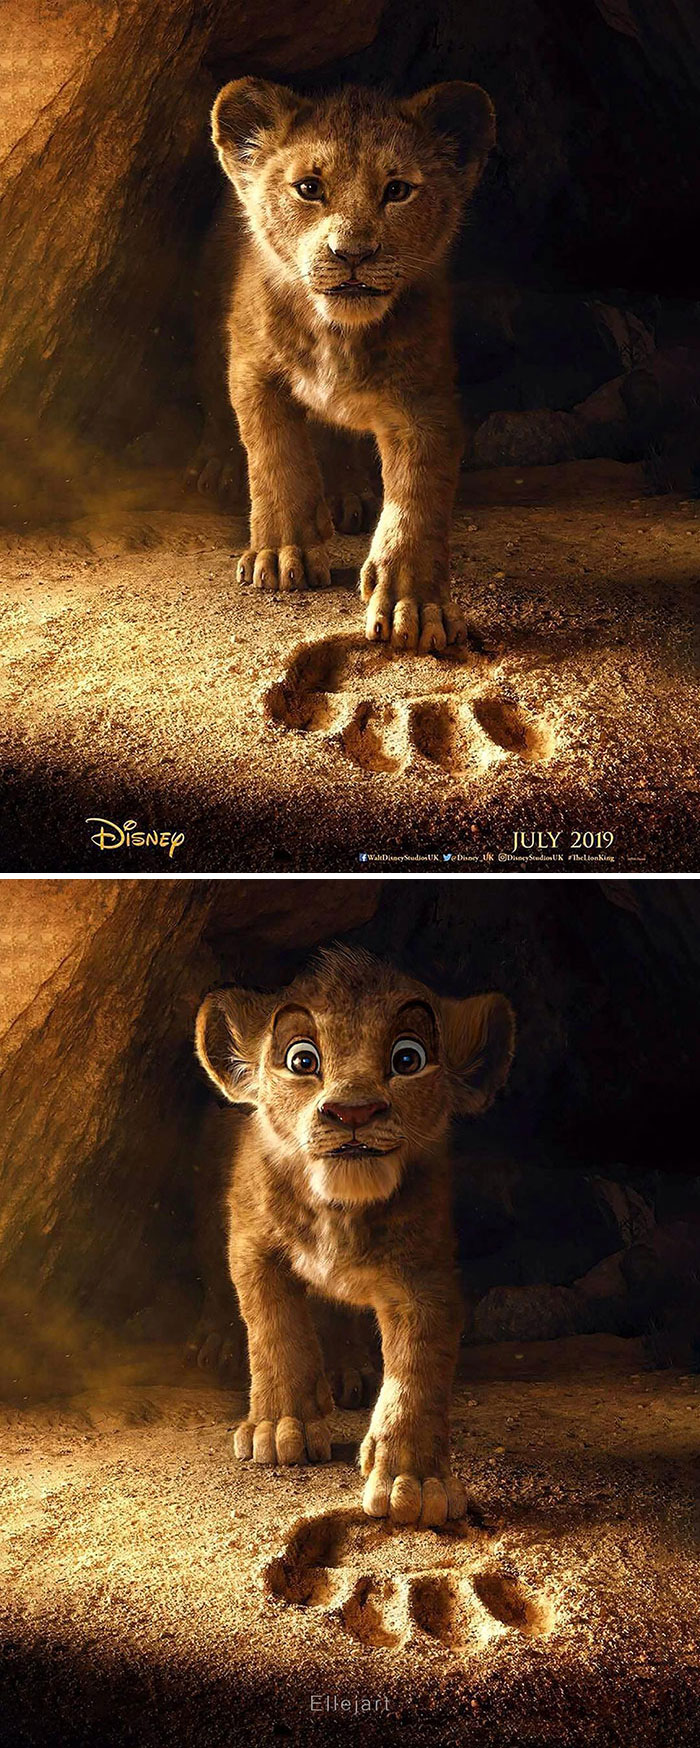 Lion King Promo Poster 1